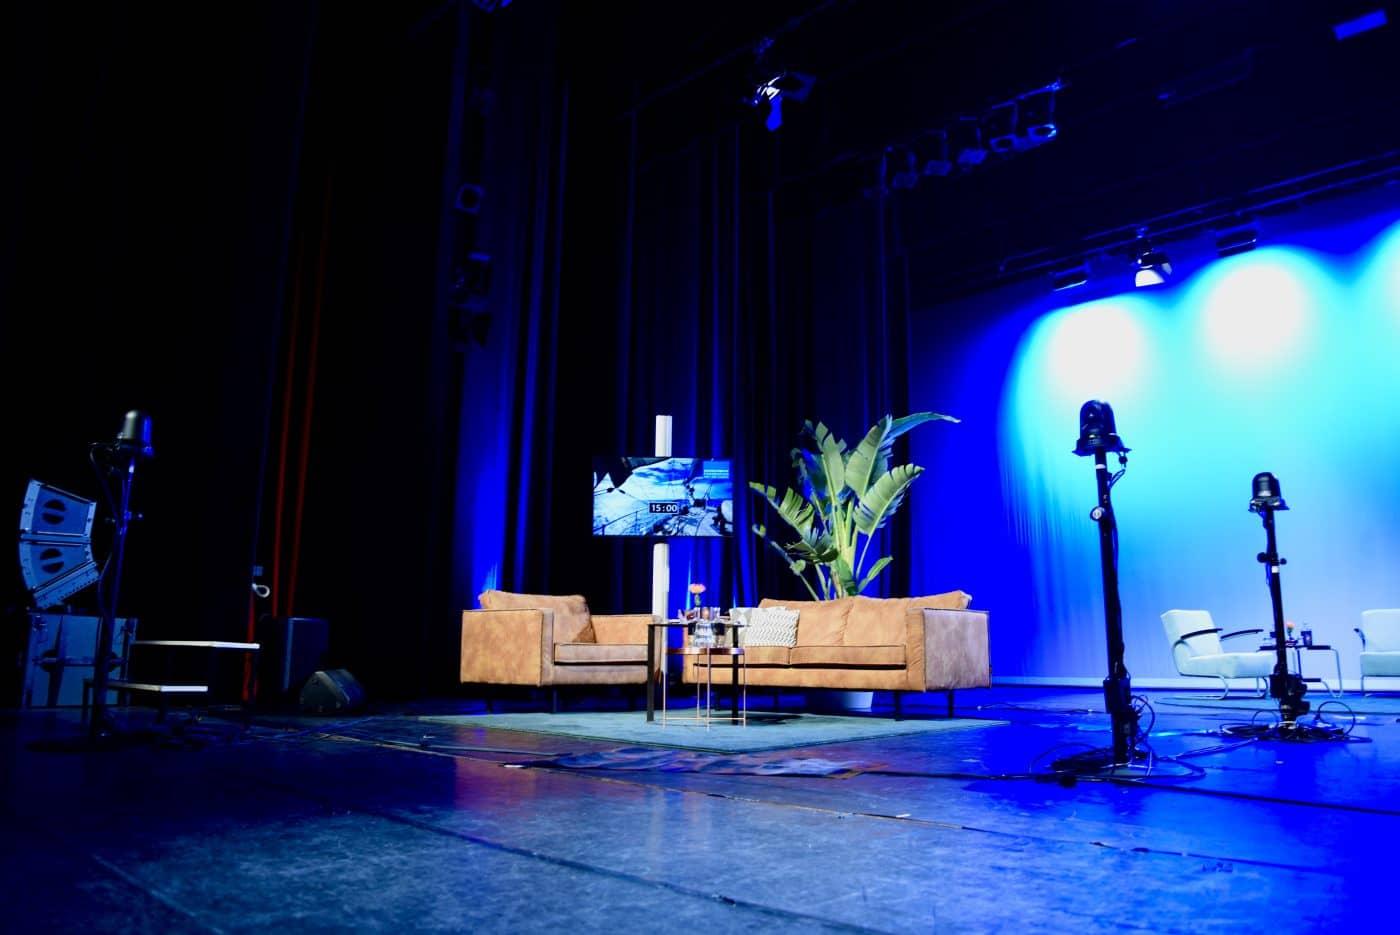 Studio Hilversum Theater setting